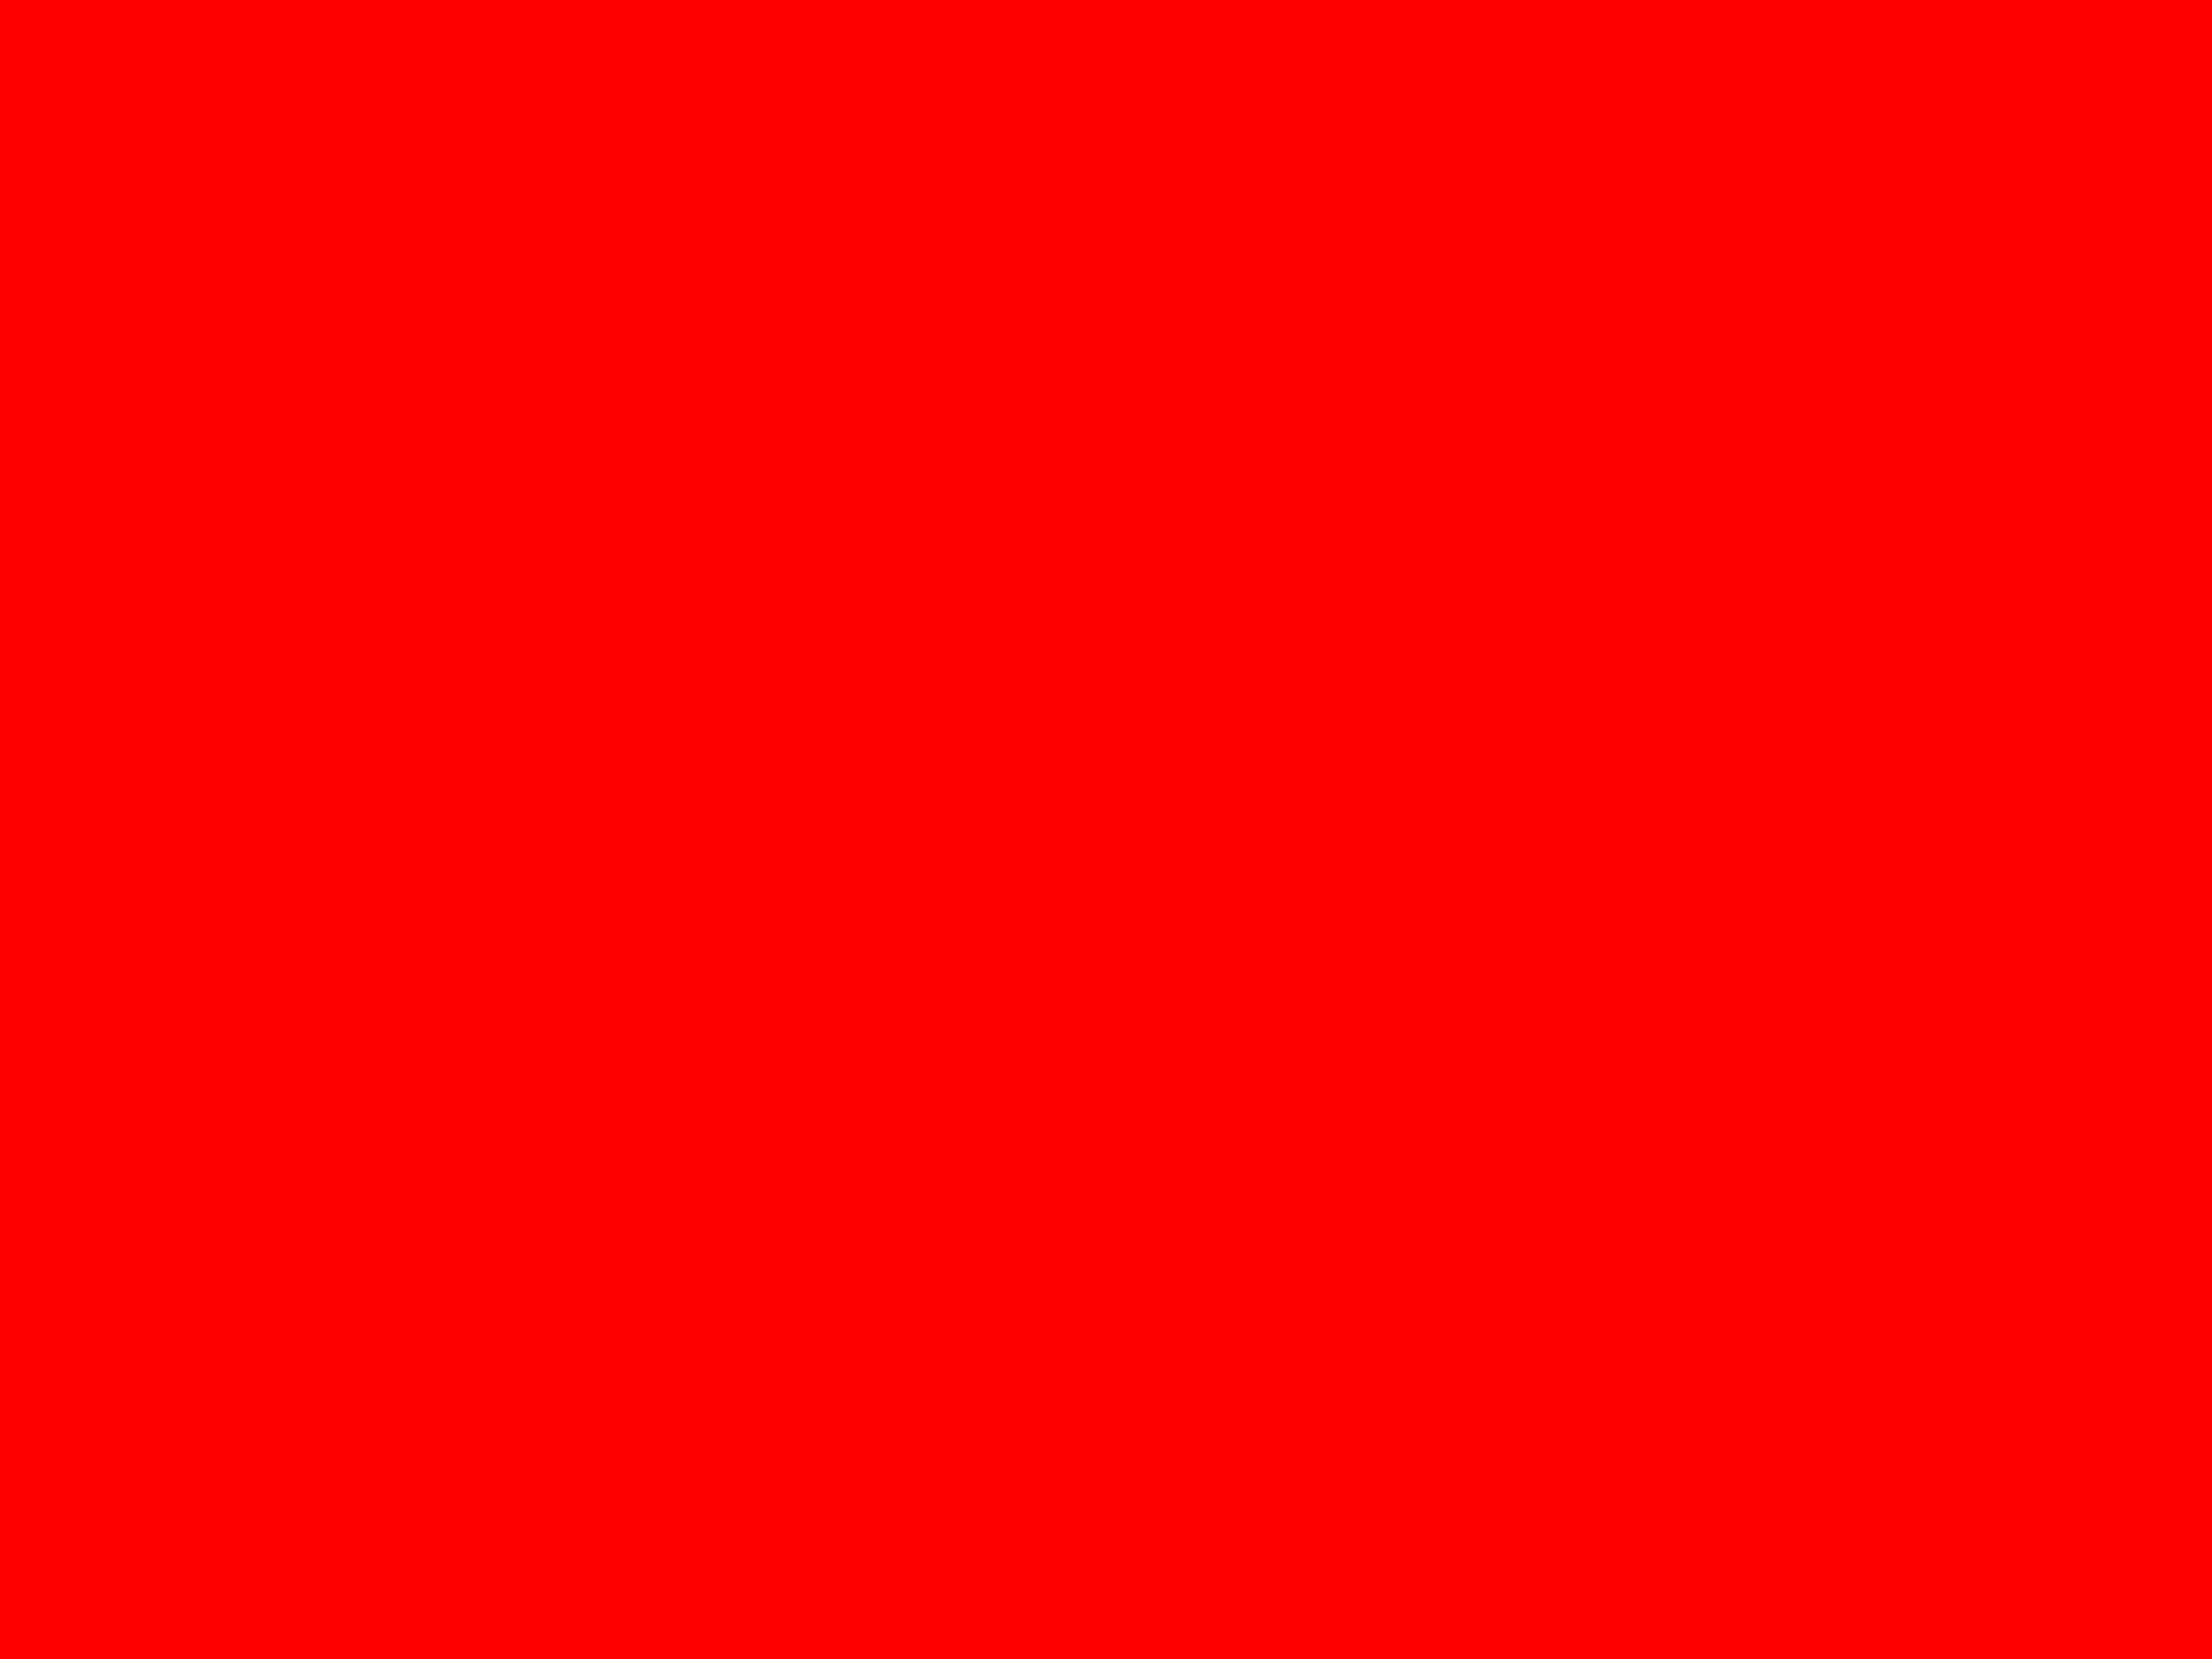 Ich sehe rot